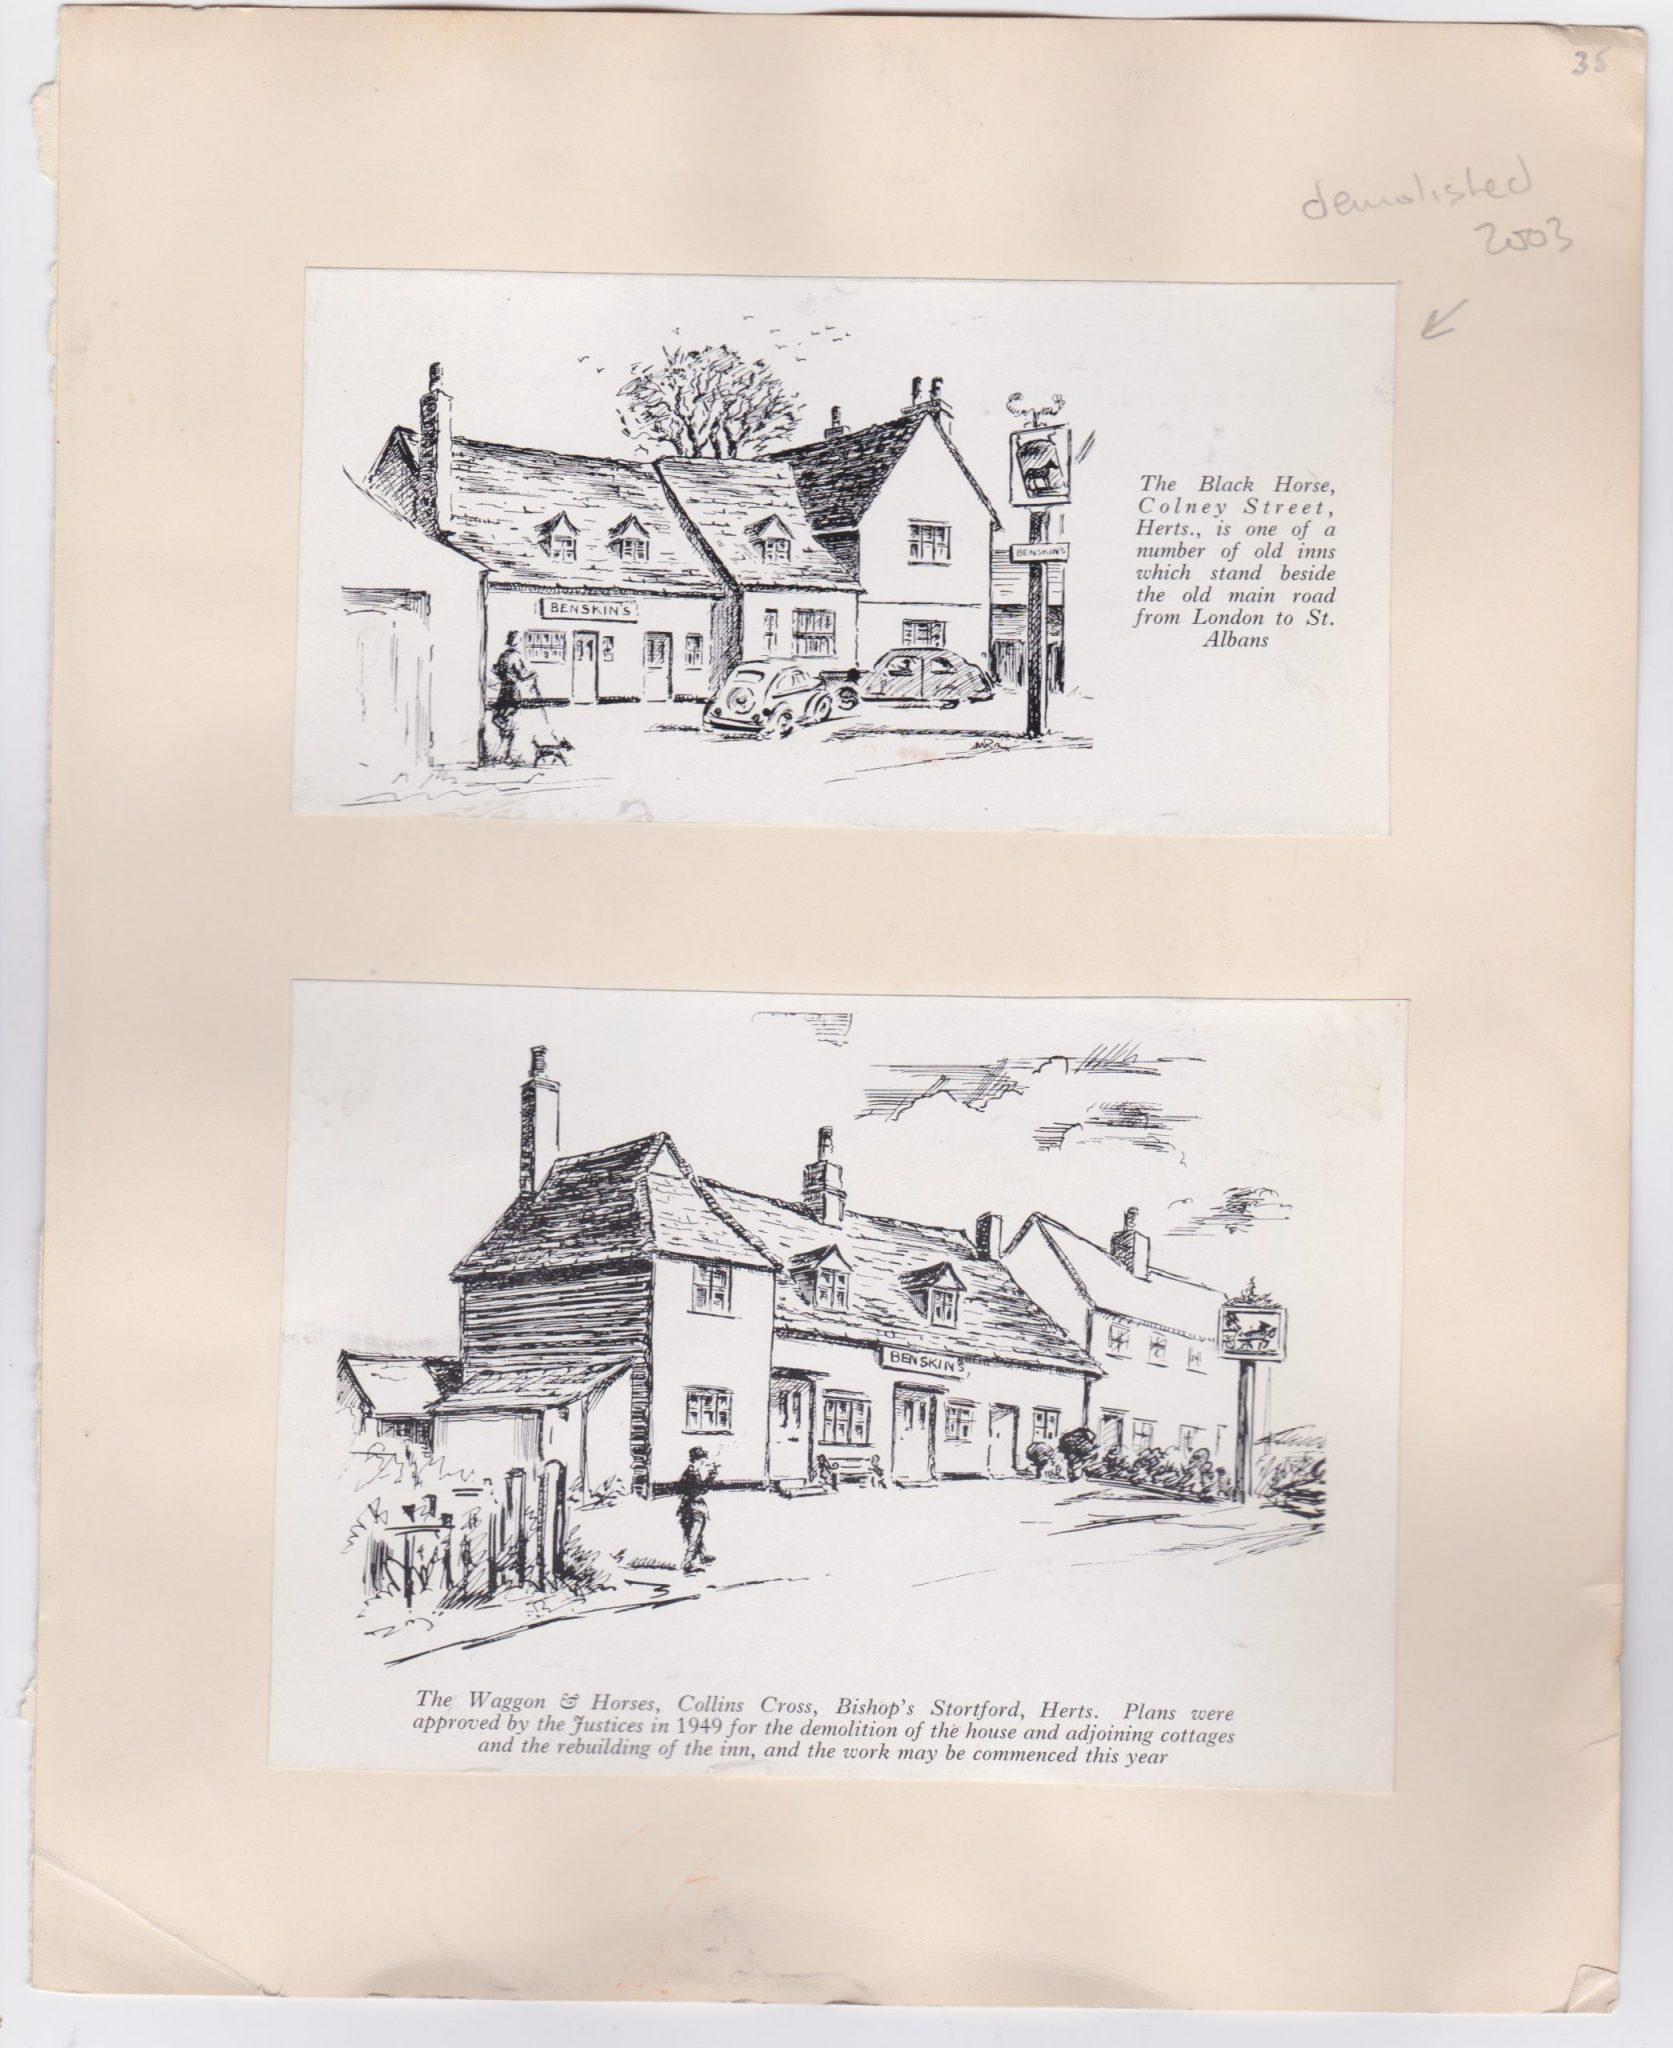 A Pub History Scrapbook Archive 8